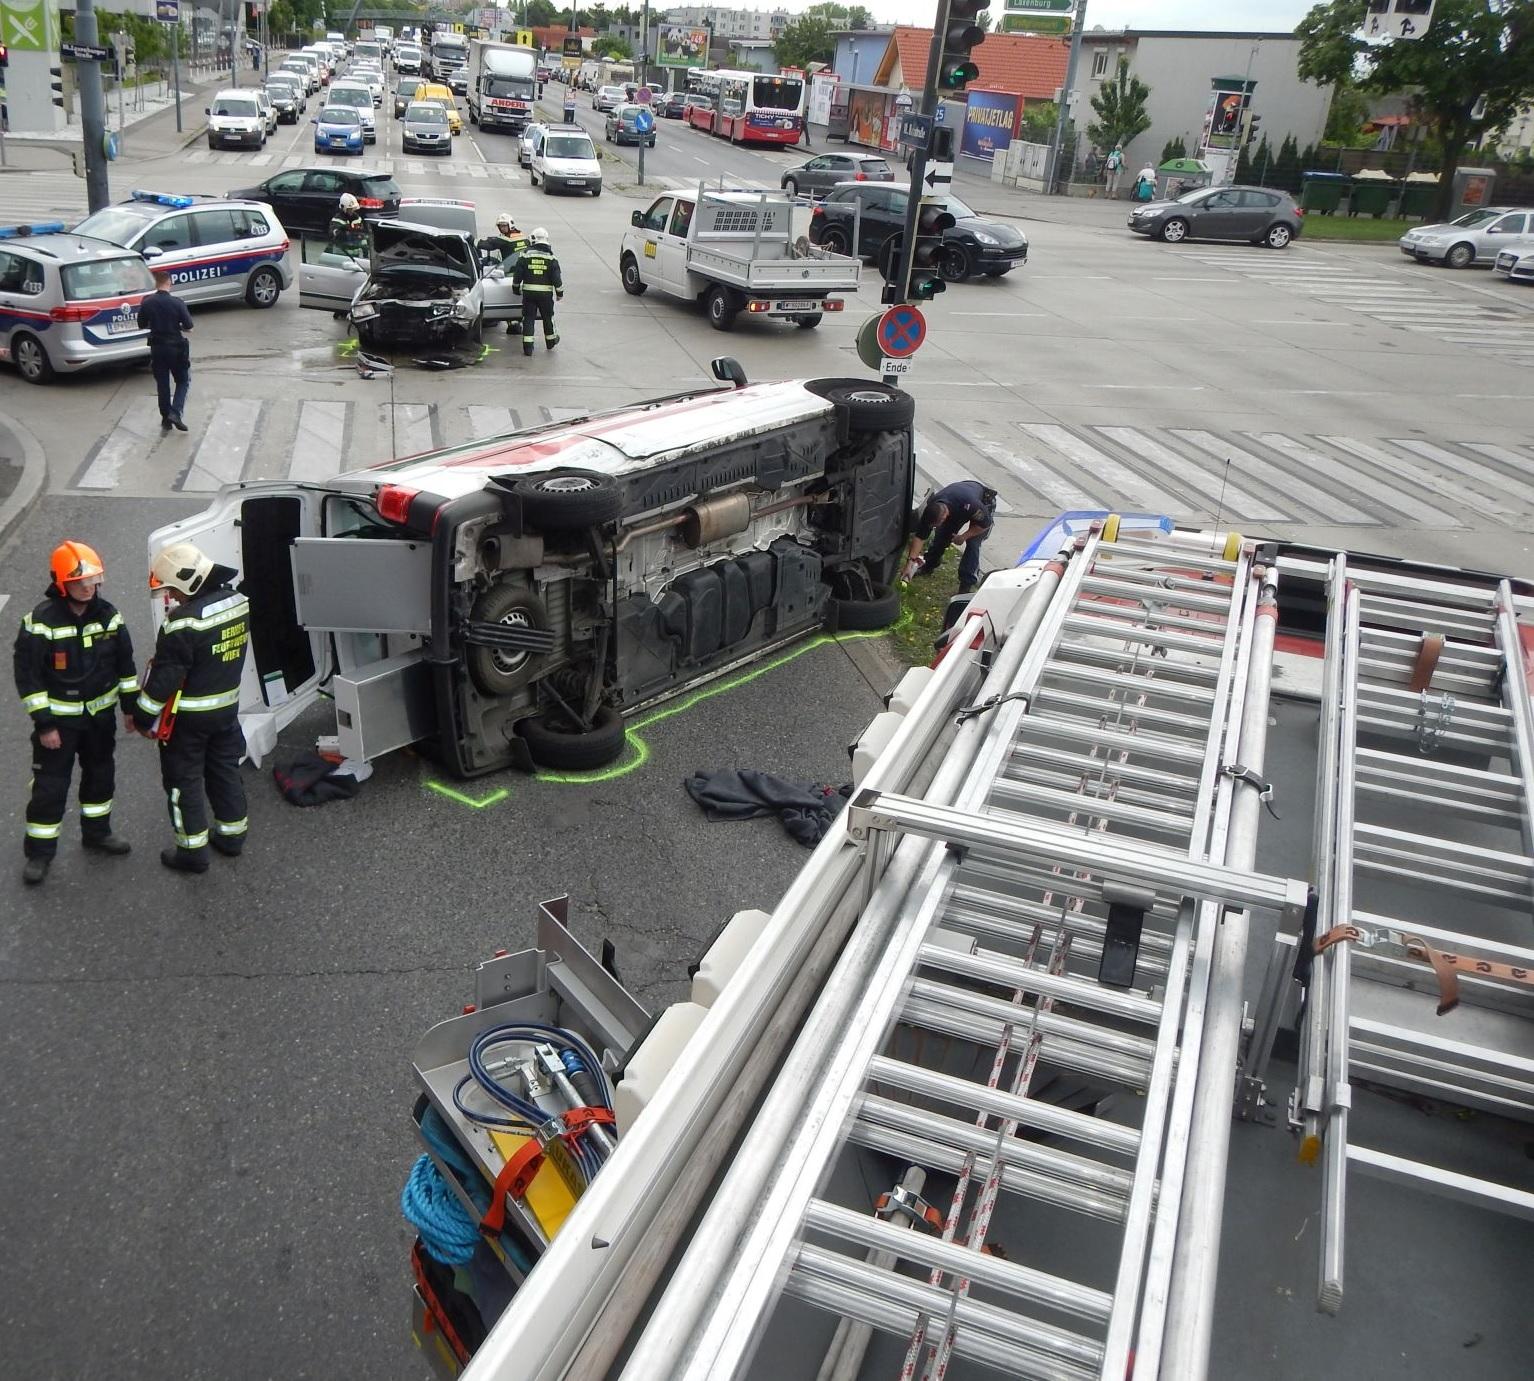 Rettungsauto bei Unfall umgestürzt – mehrere Verletzte – ÖBFV